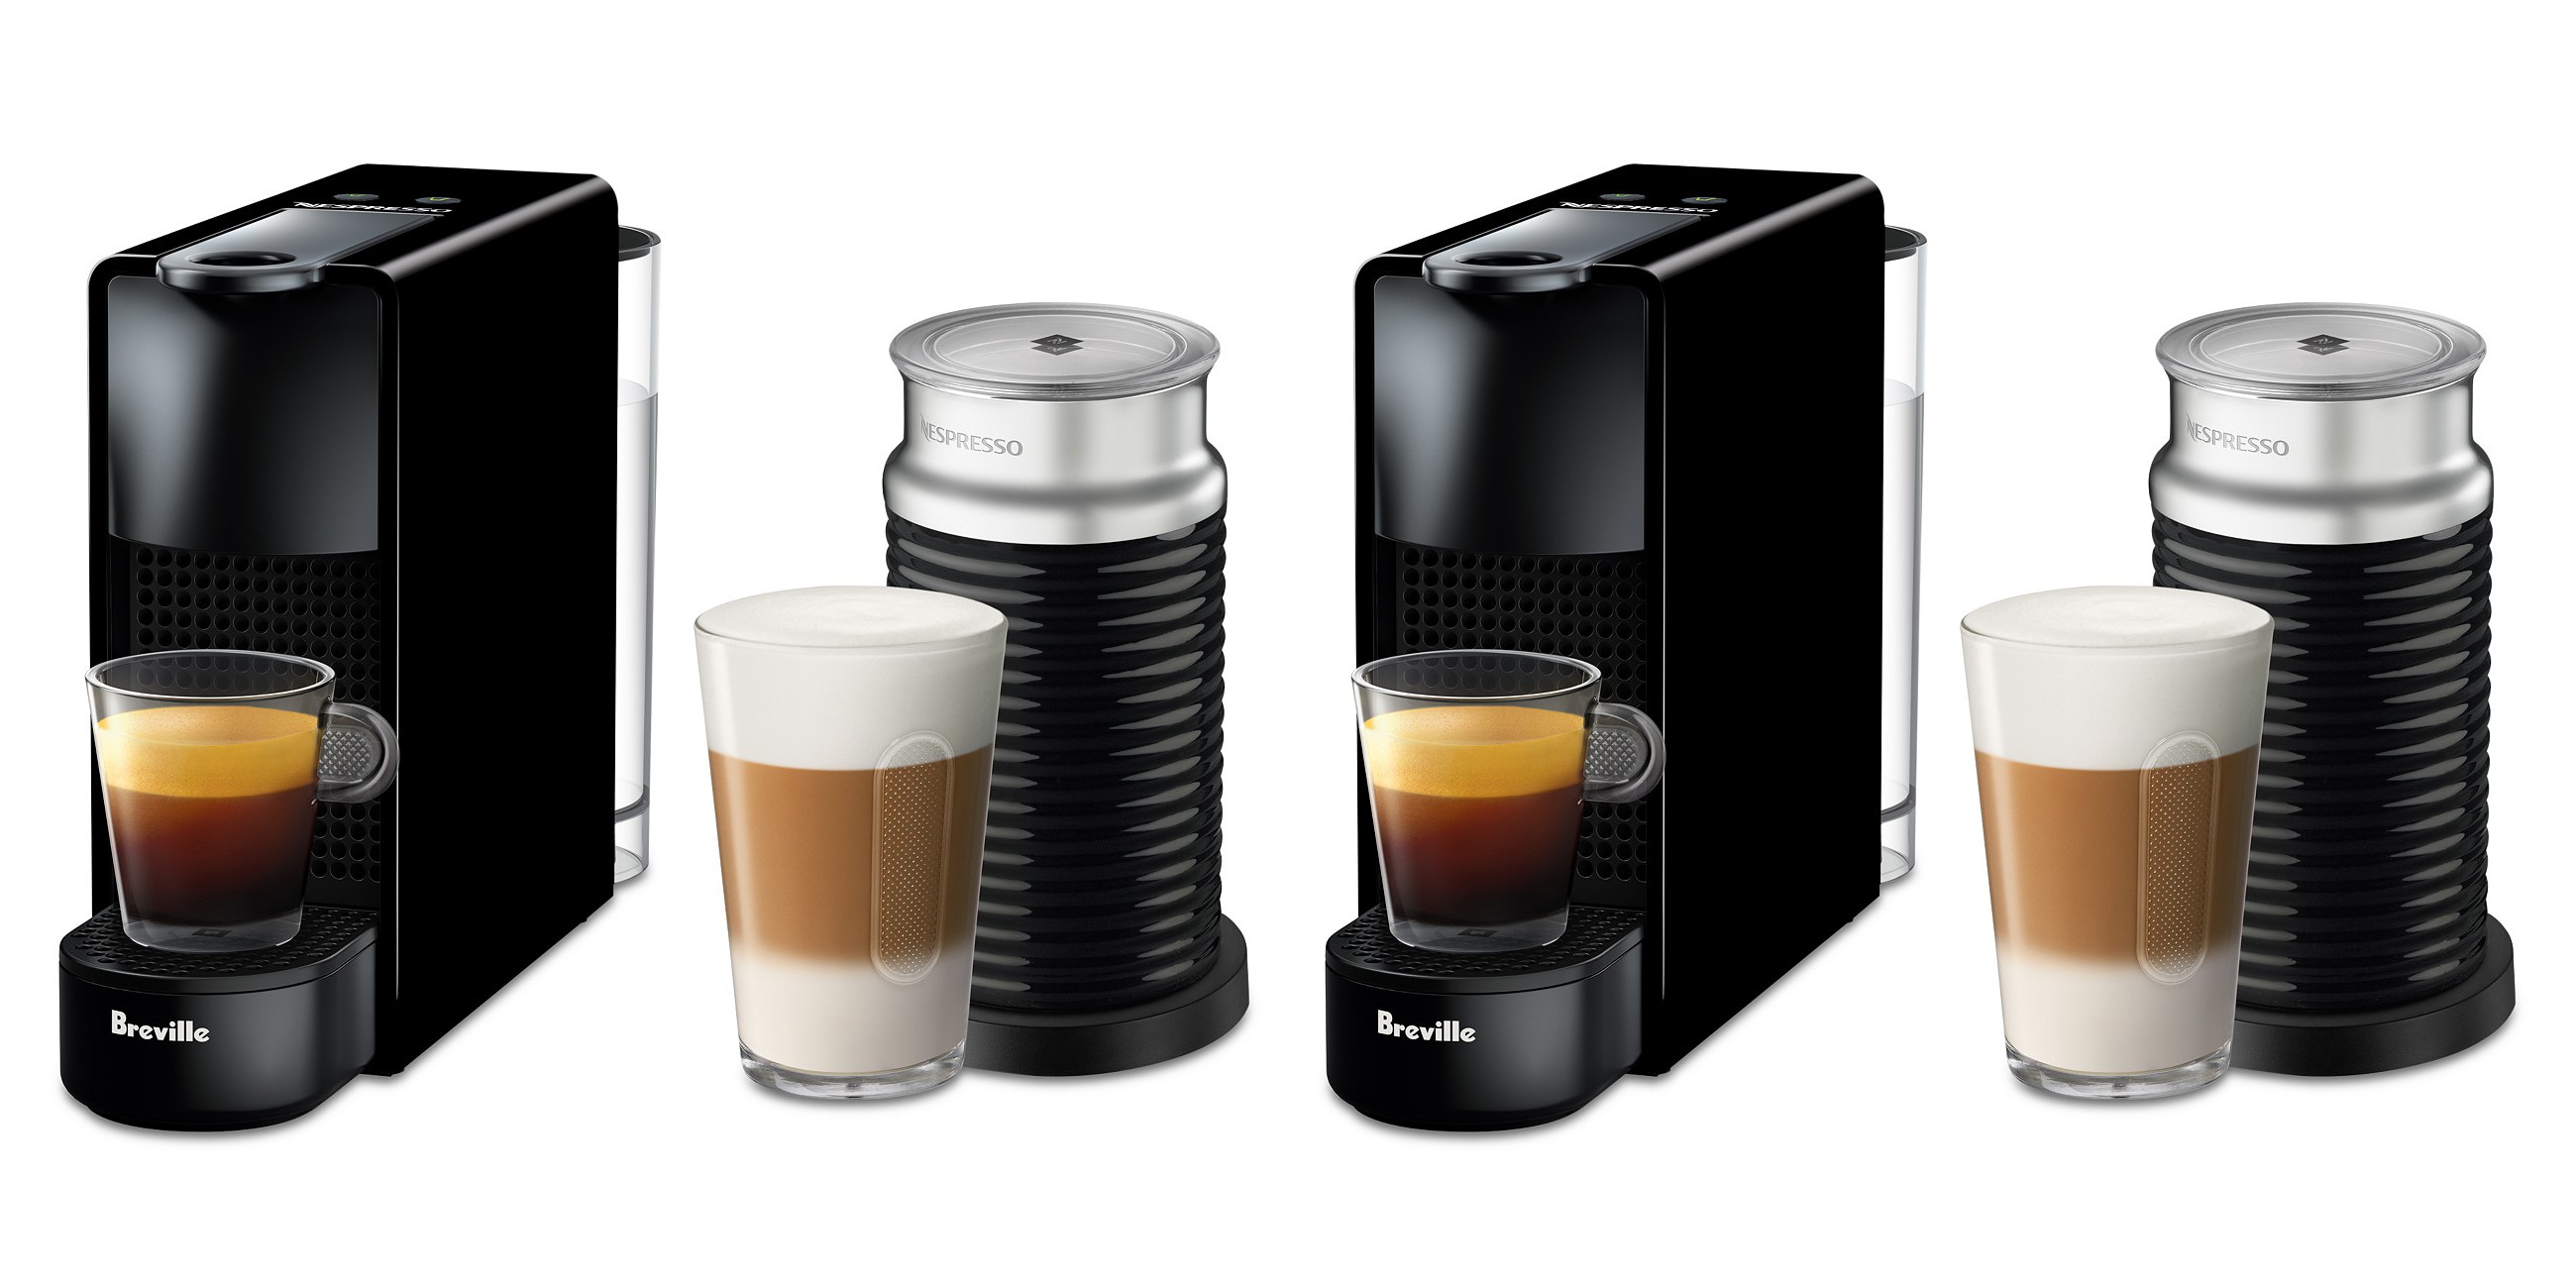 Add a Nespresso Mini Espresso Machine to your morning routine at more than $100 off